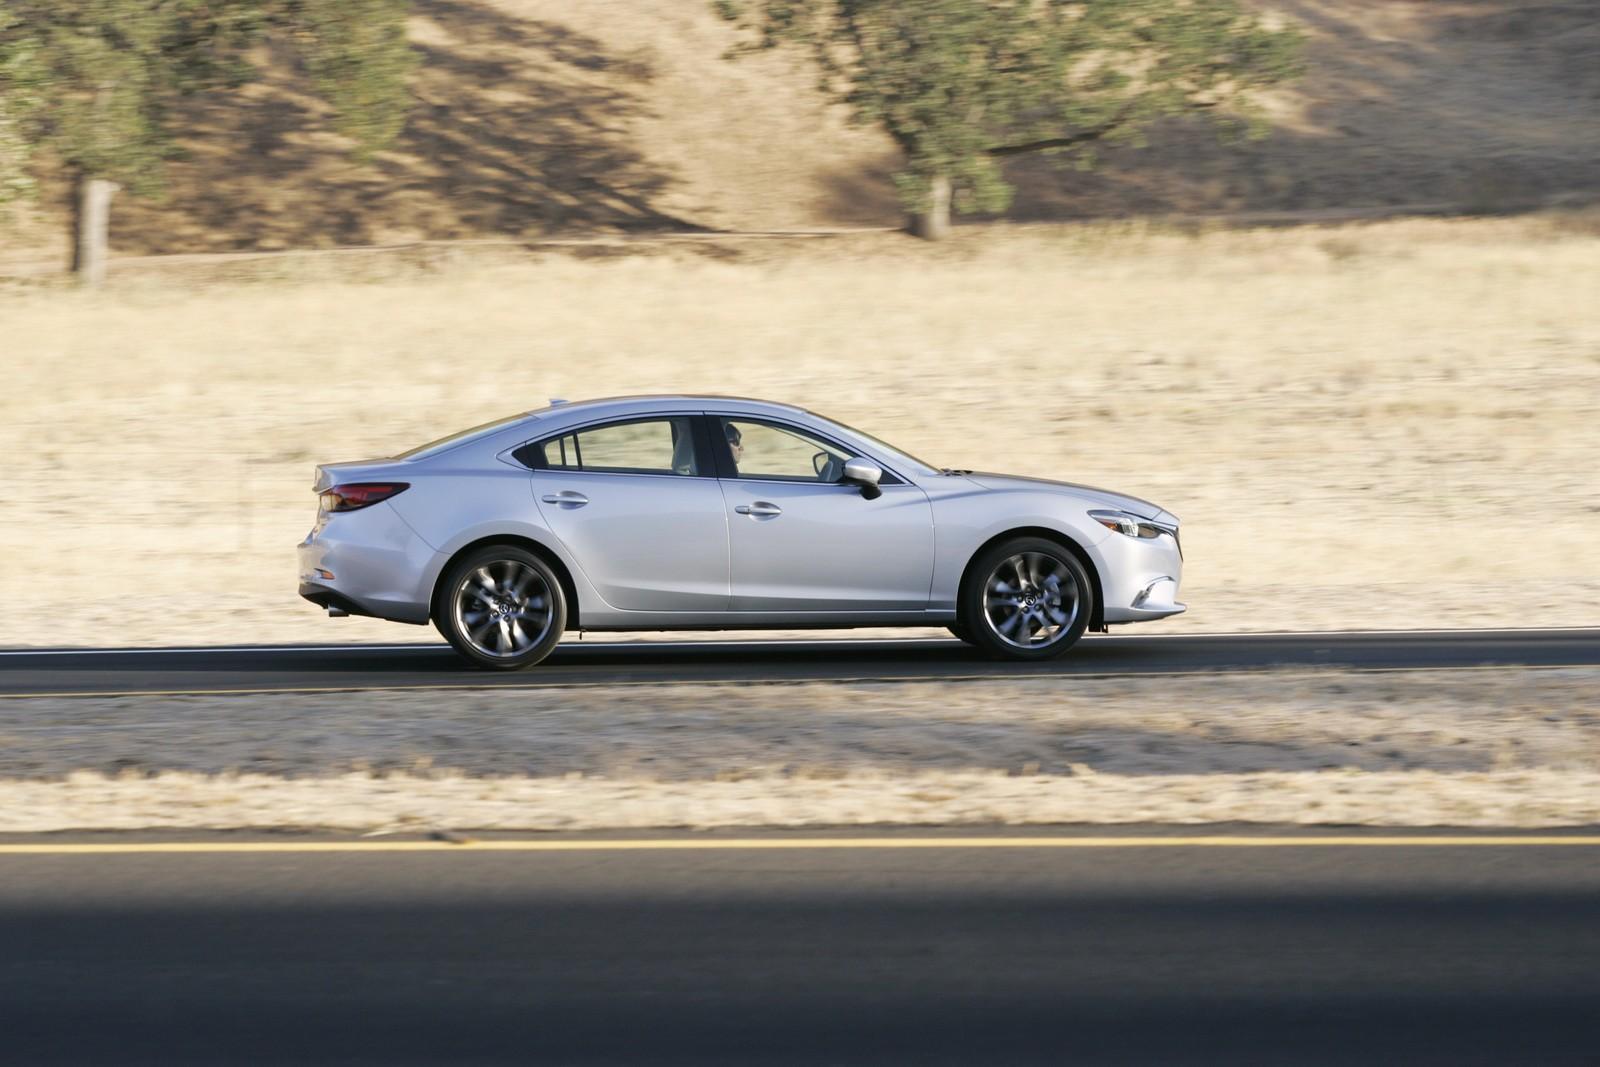 Ngoại thất thanh lịch của Mazda 6 Facelift 2016